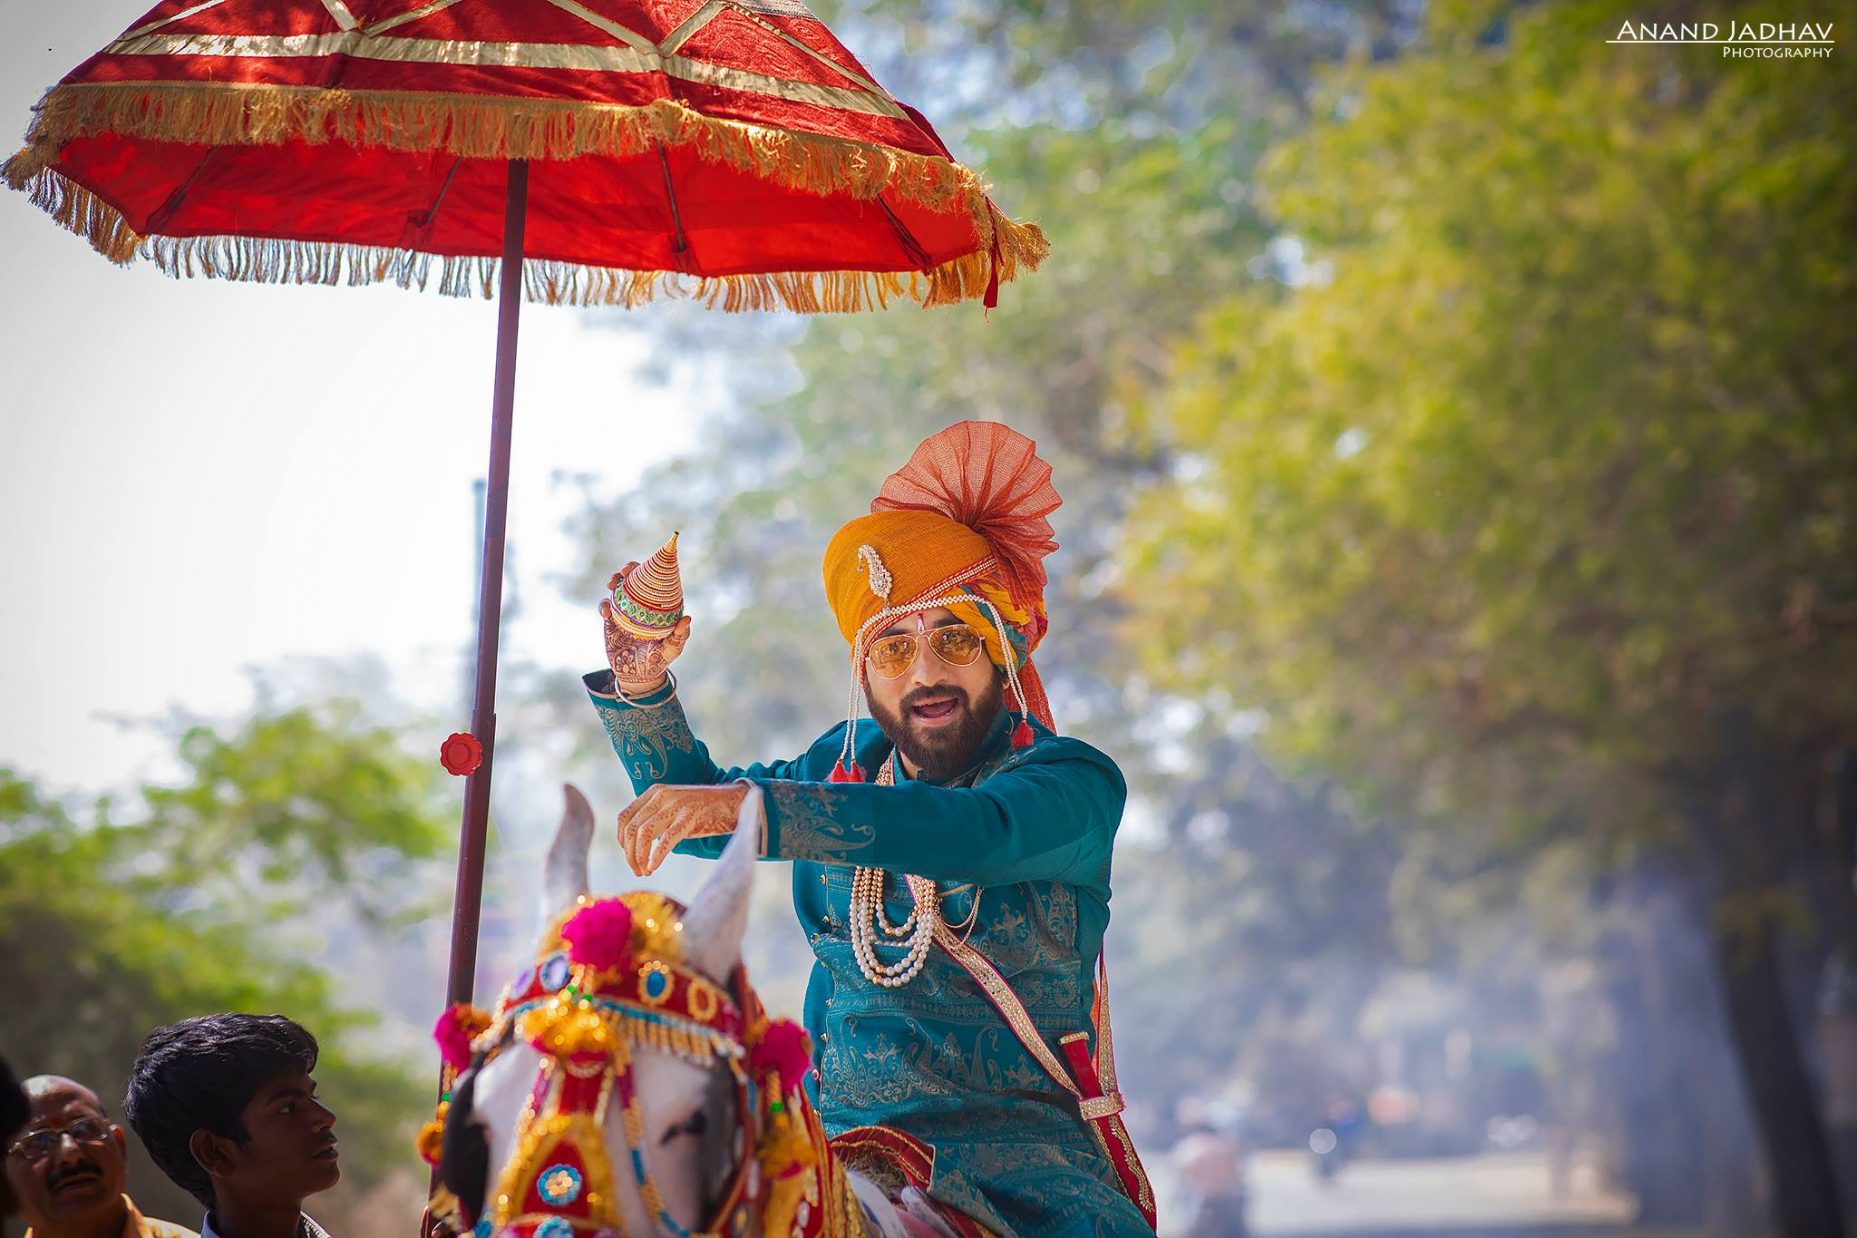 AnandJadhav_Weddings14